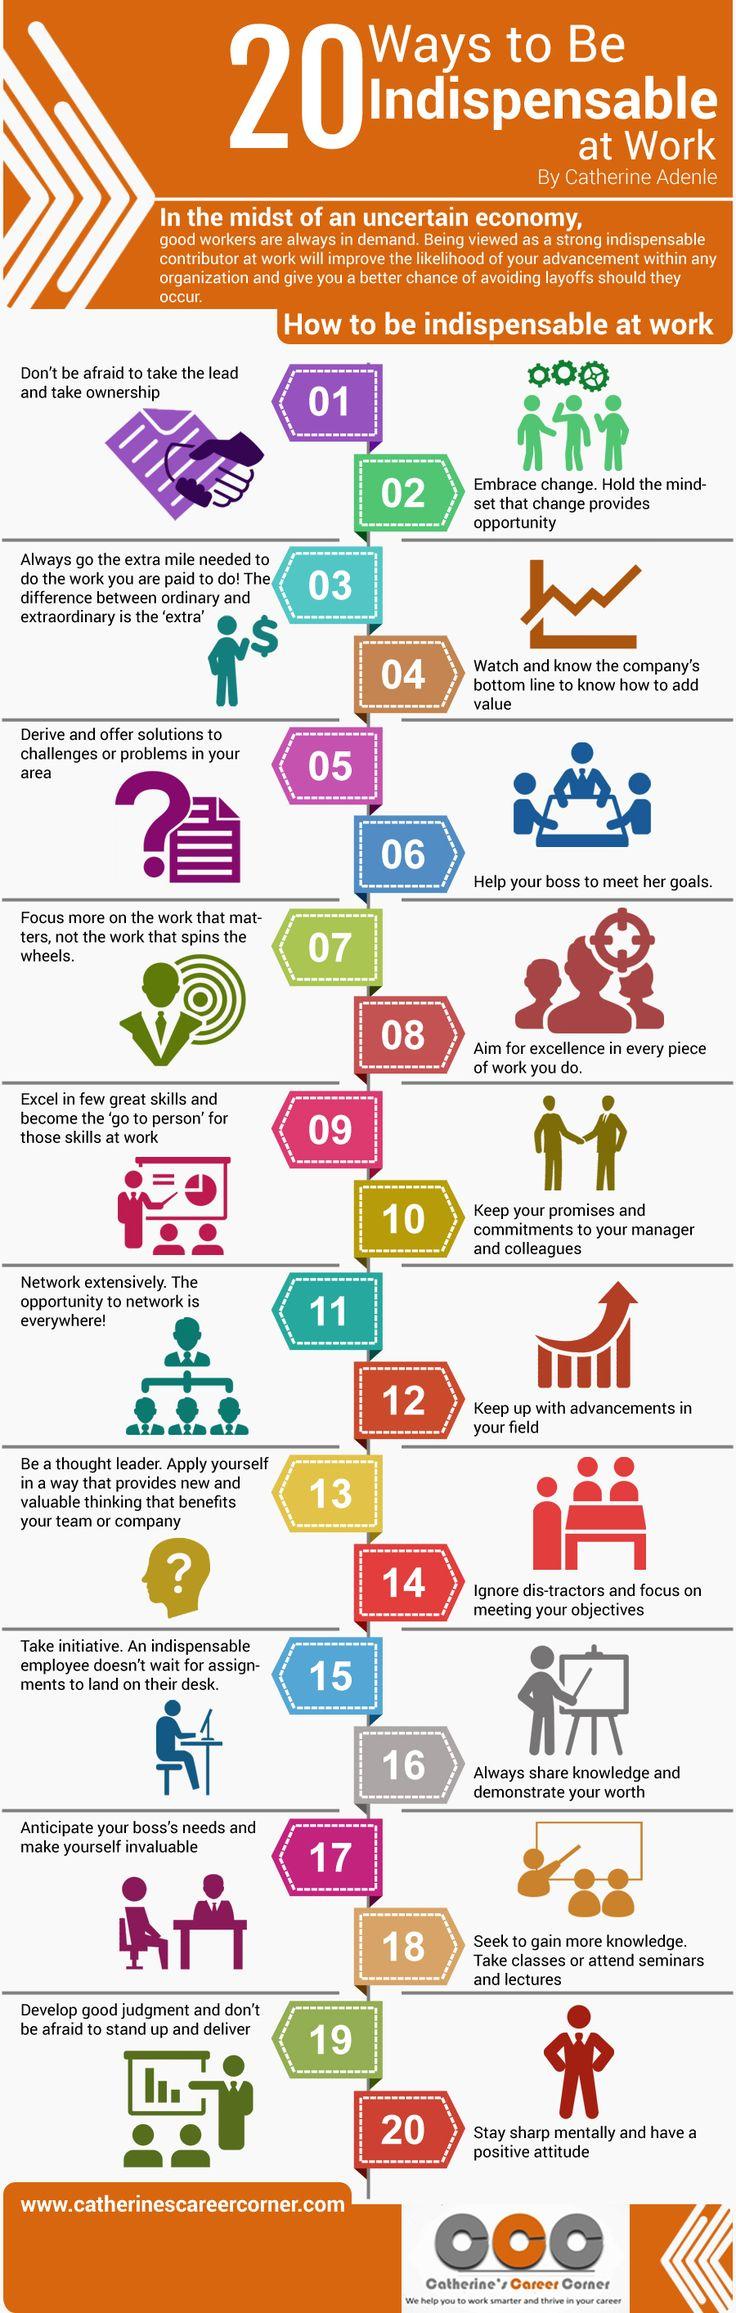 133 best Job Prep images on Pinterest | Career, Personal development ...